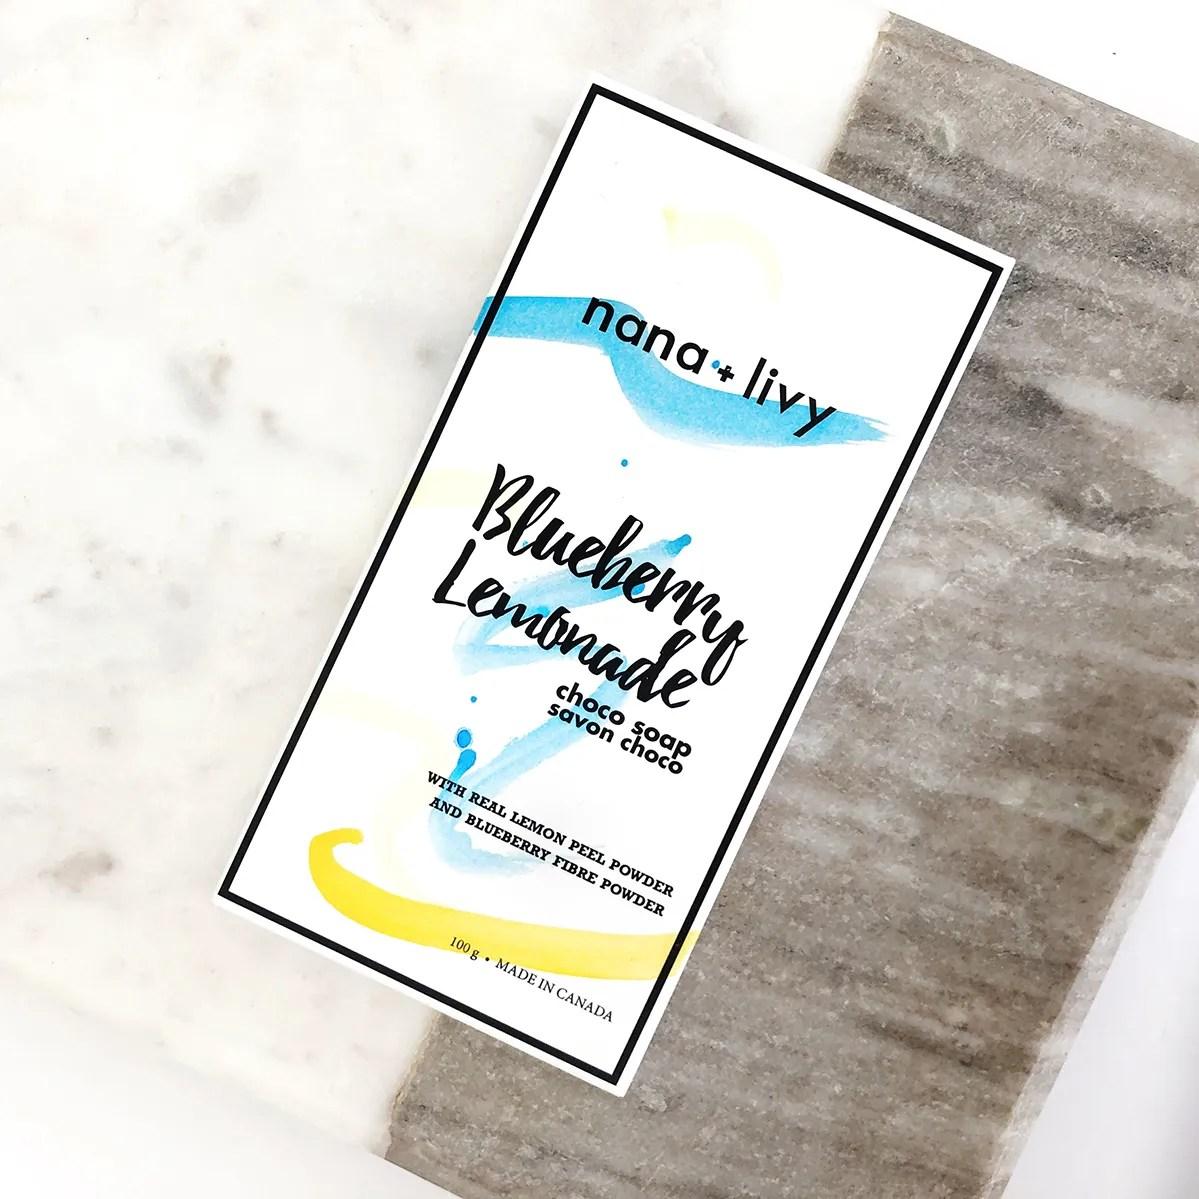 Blueberry Lemonade Choco Soap